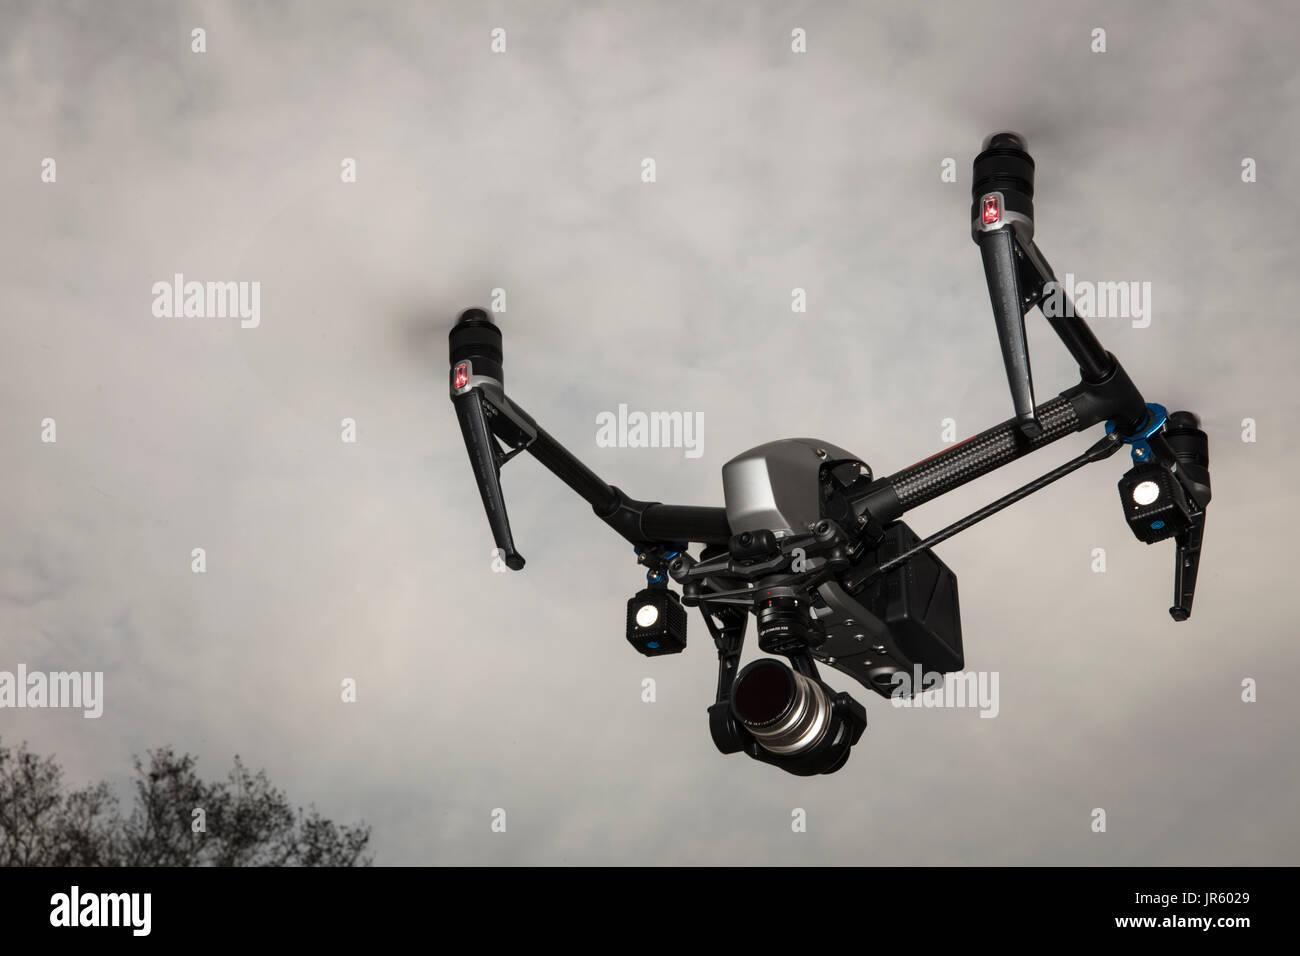 Inspire flying - Stock Image